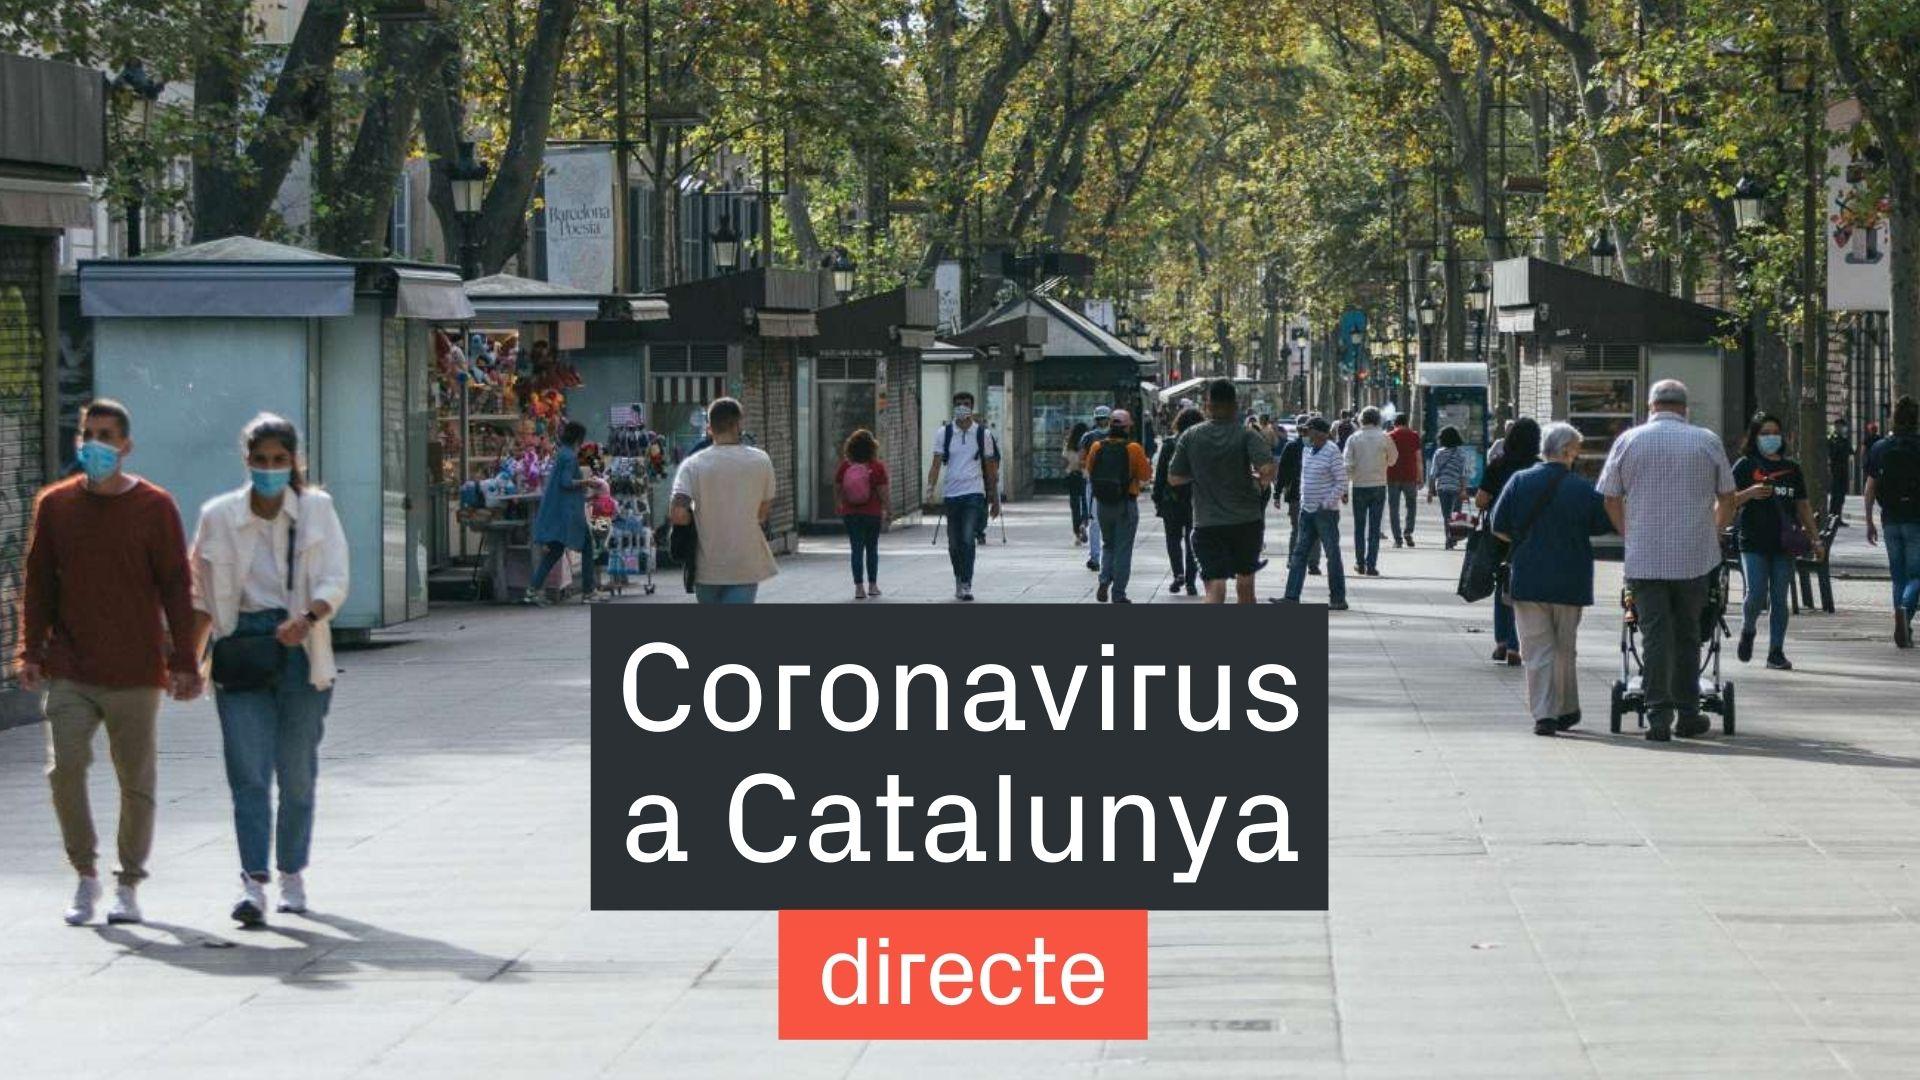 directe coronavirus catalunya ultima hora